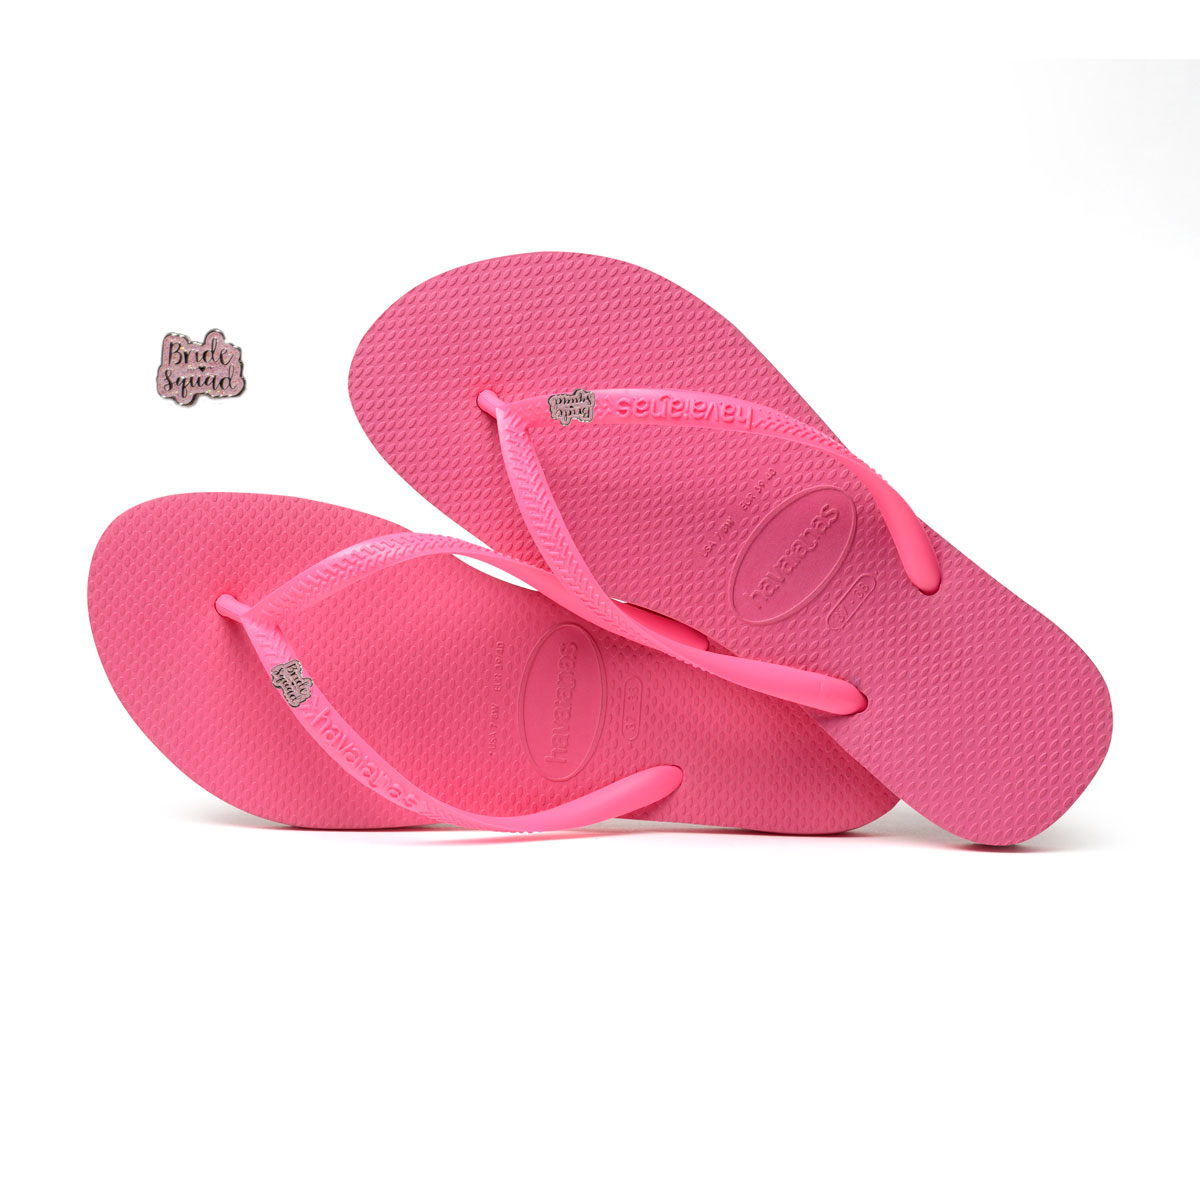 Havaianas Shocking Pink Flip Flops with Pink Glitter Bride Squad Charm